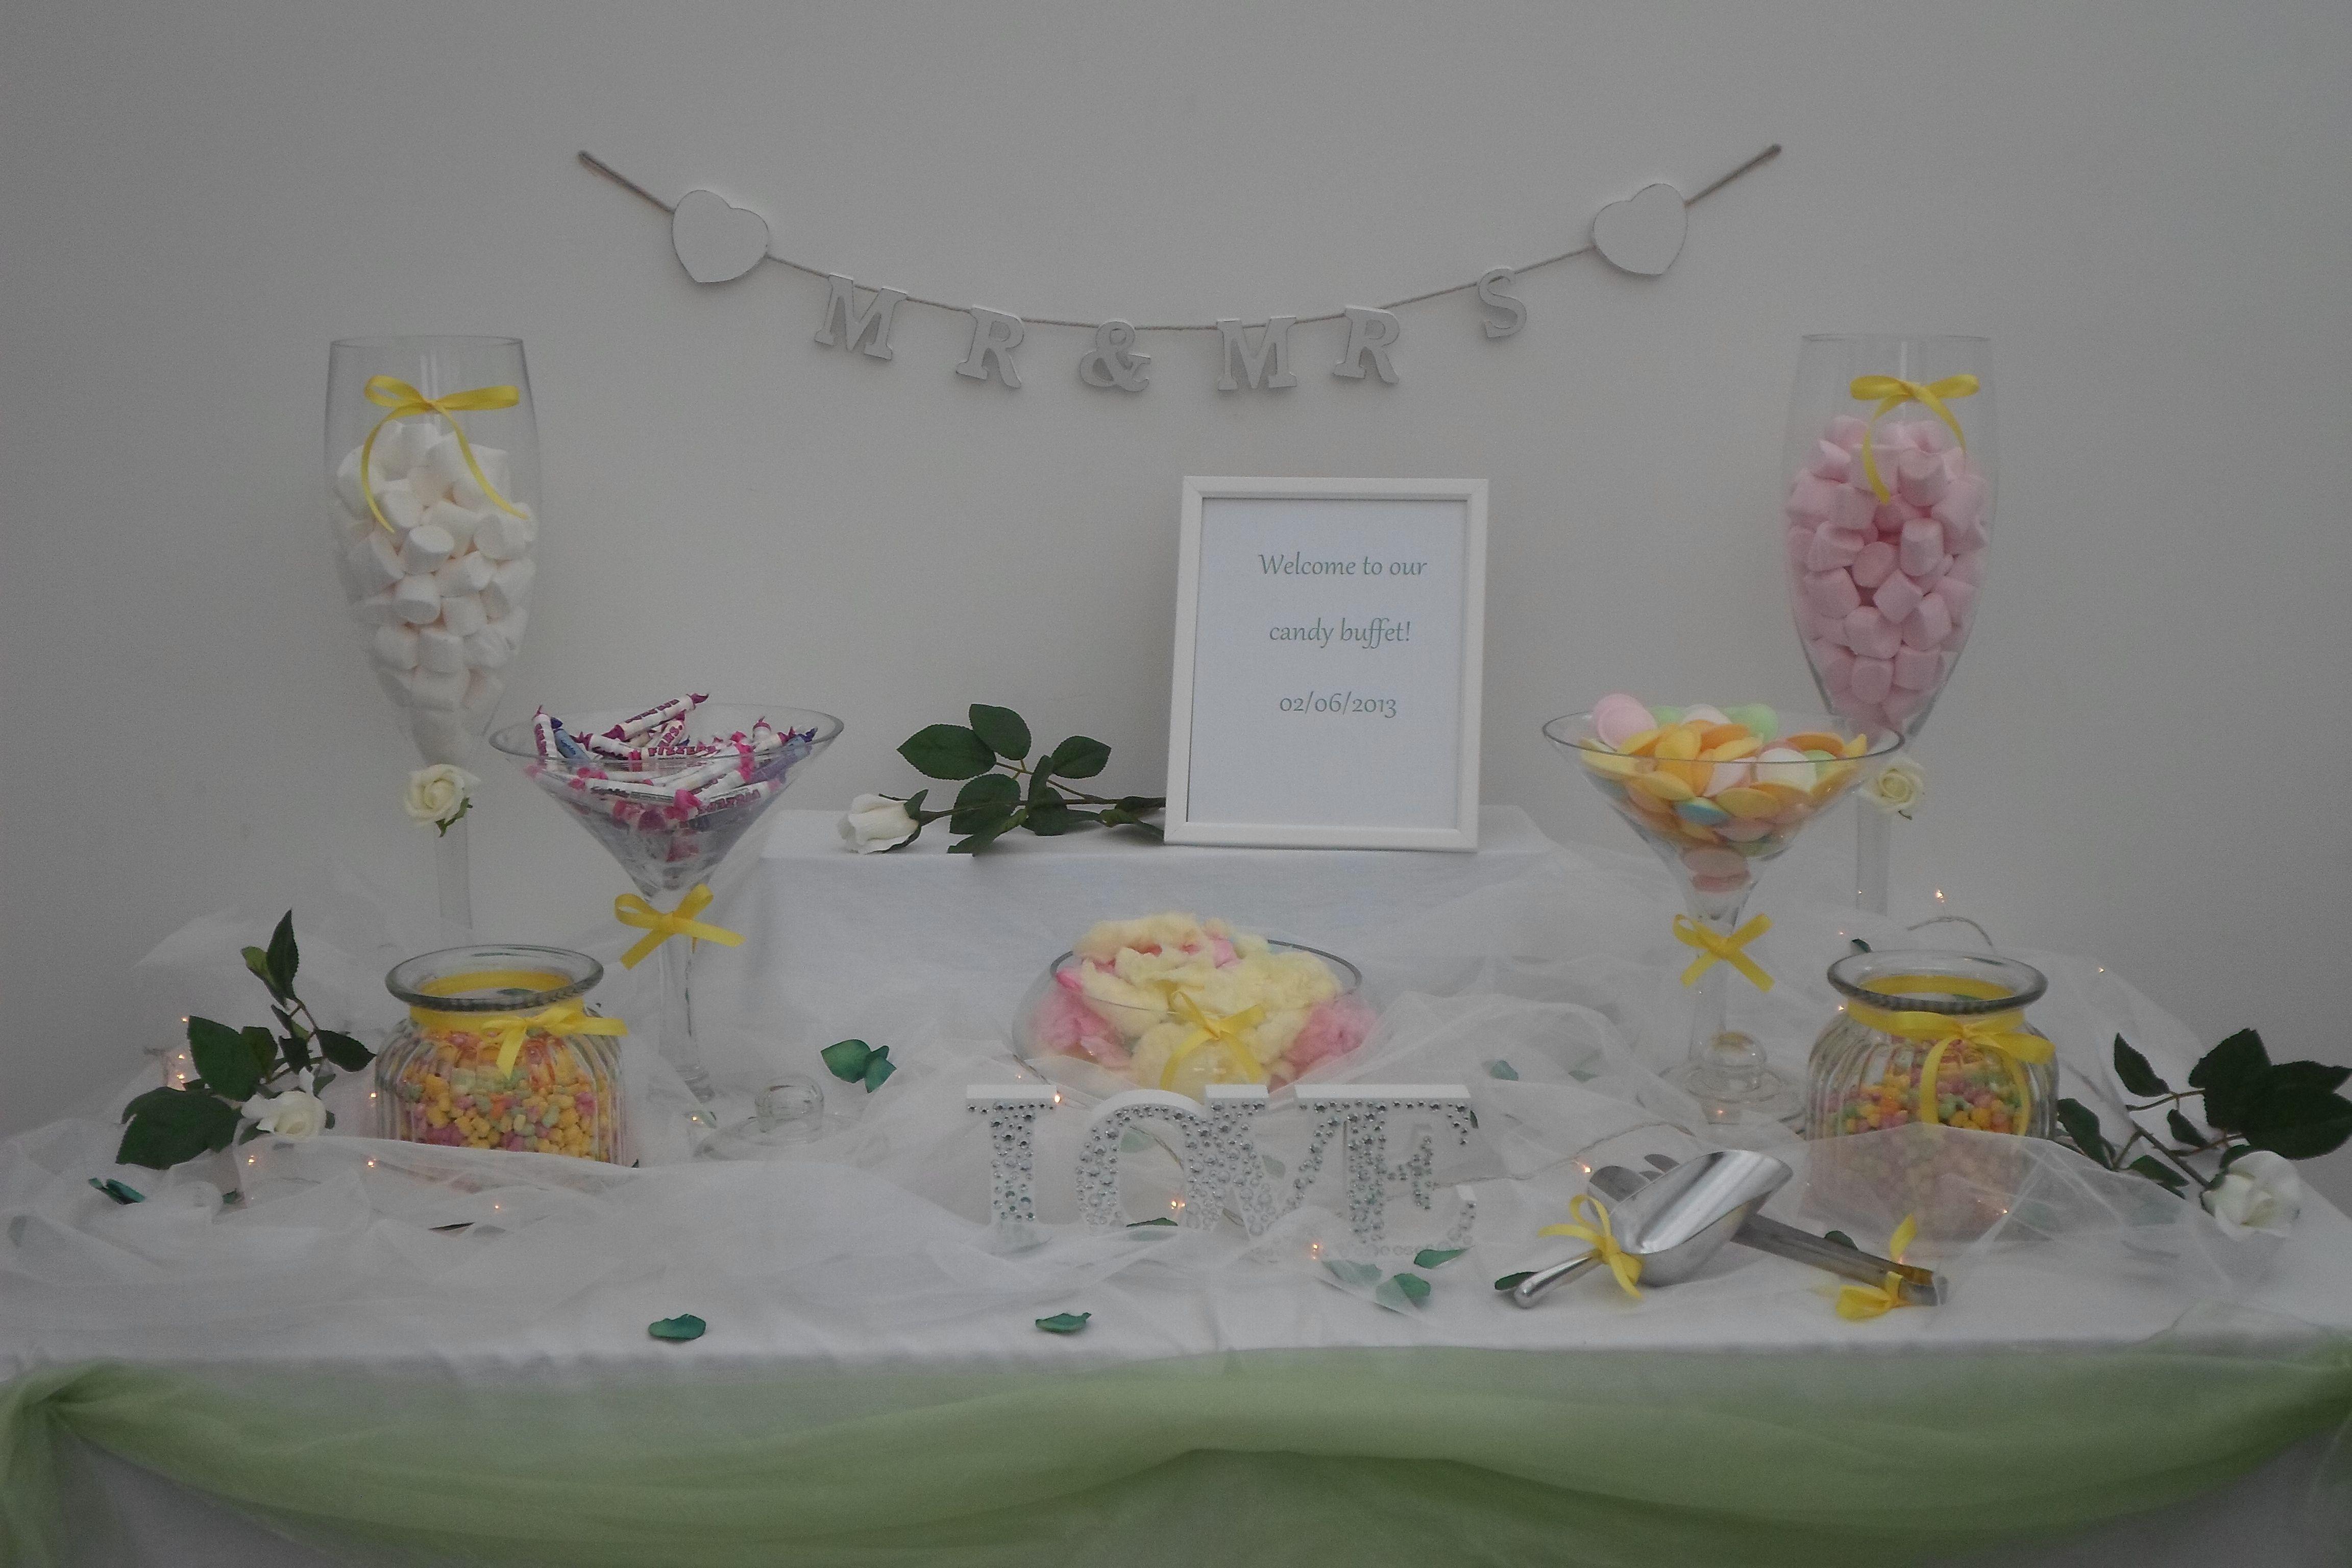 Our wedding candy buffet using a garden theme!